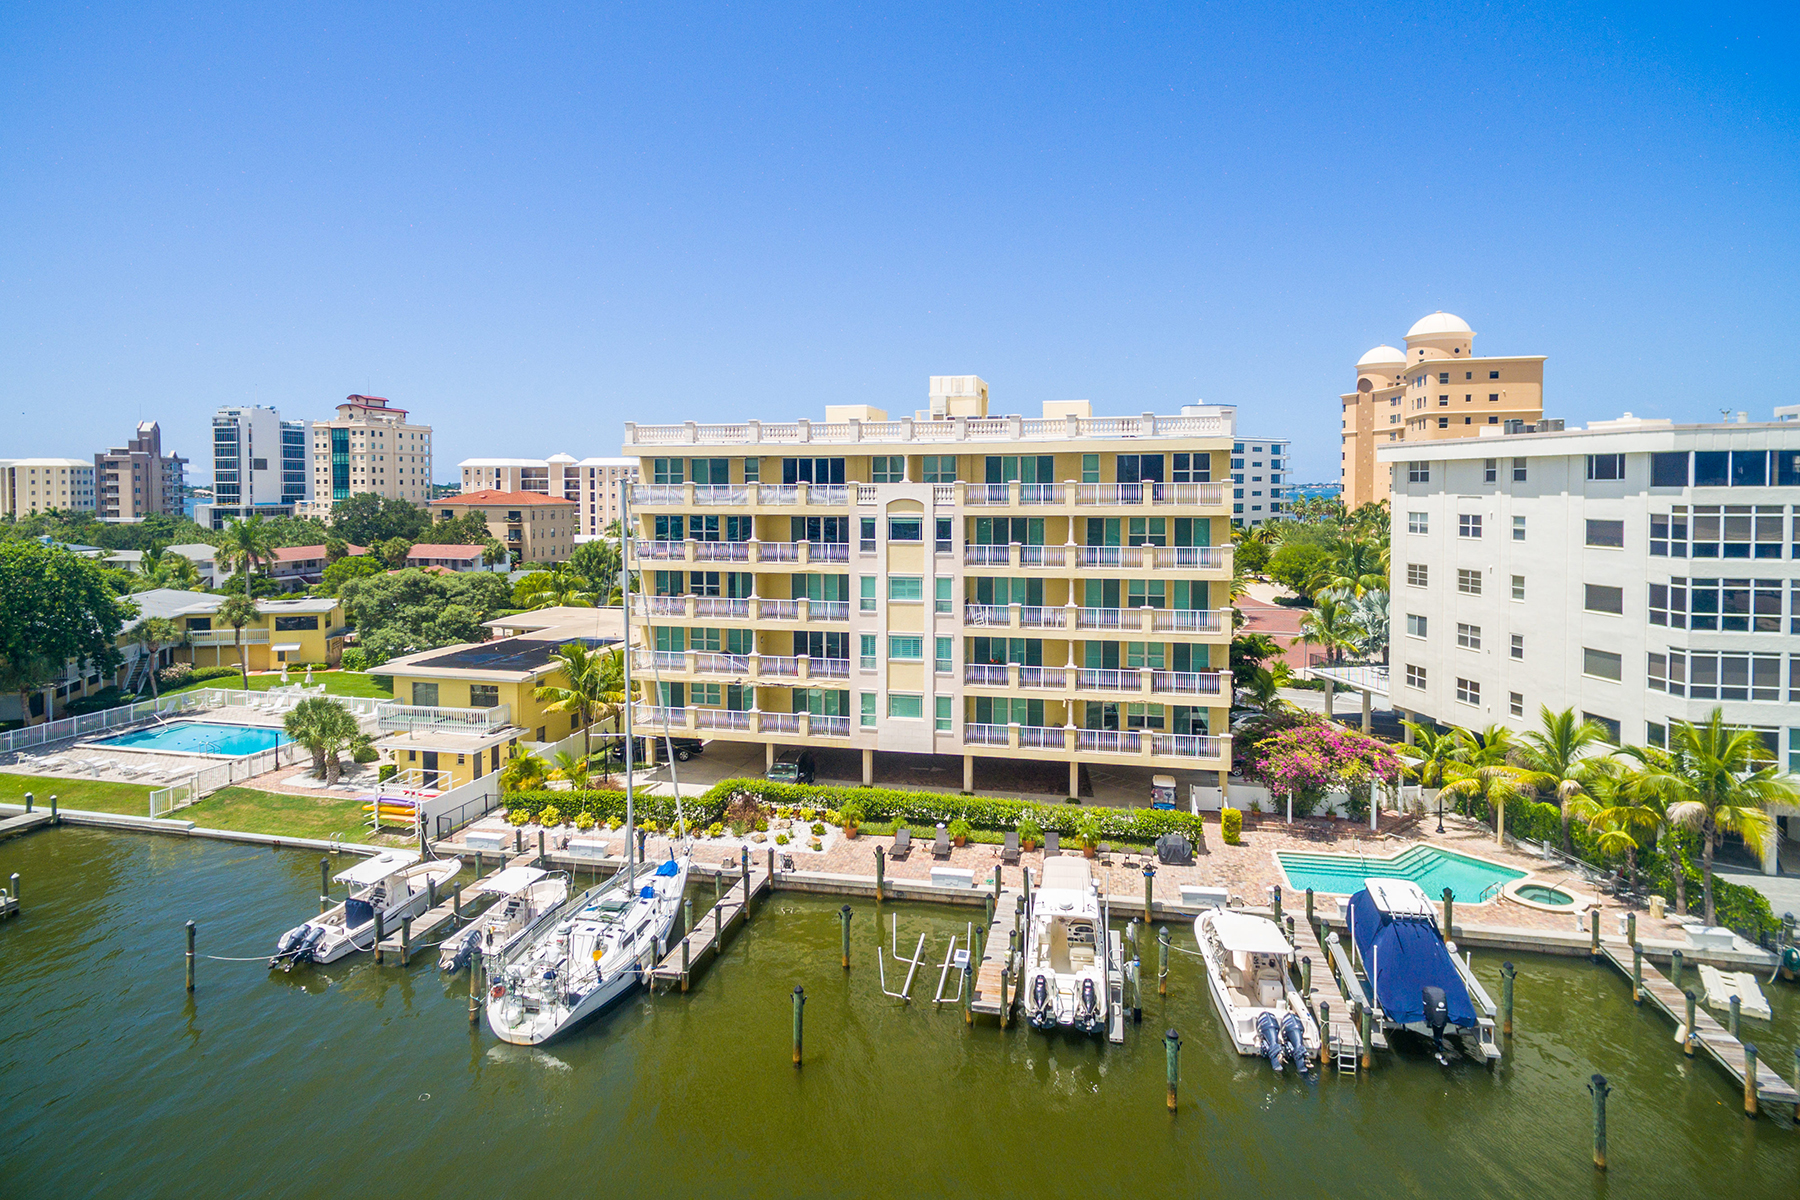 Condominium for Sale at GOLDEN GATE POINT 650 Golden Gate Pt 402 Sarasota, Florida, 34236 United States